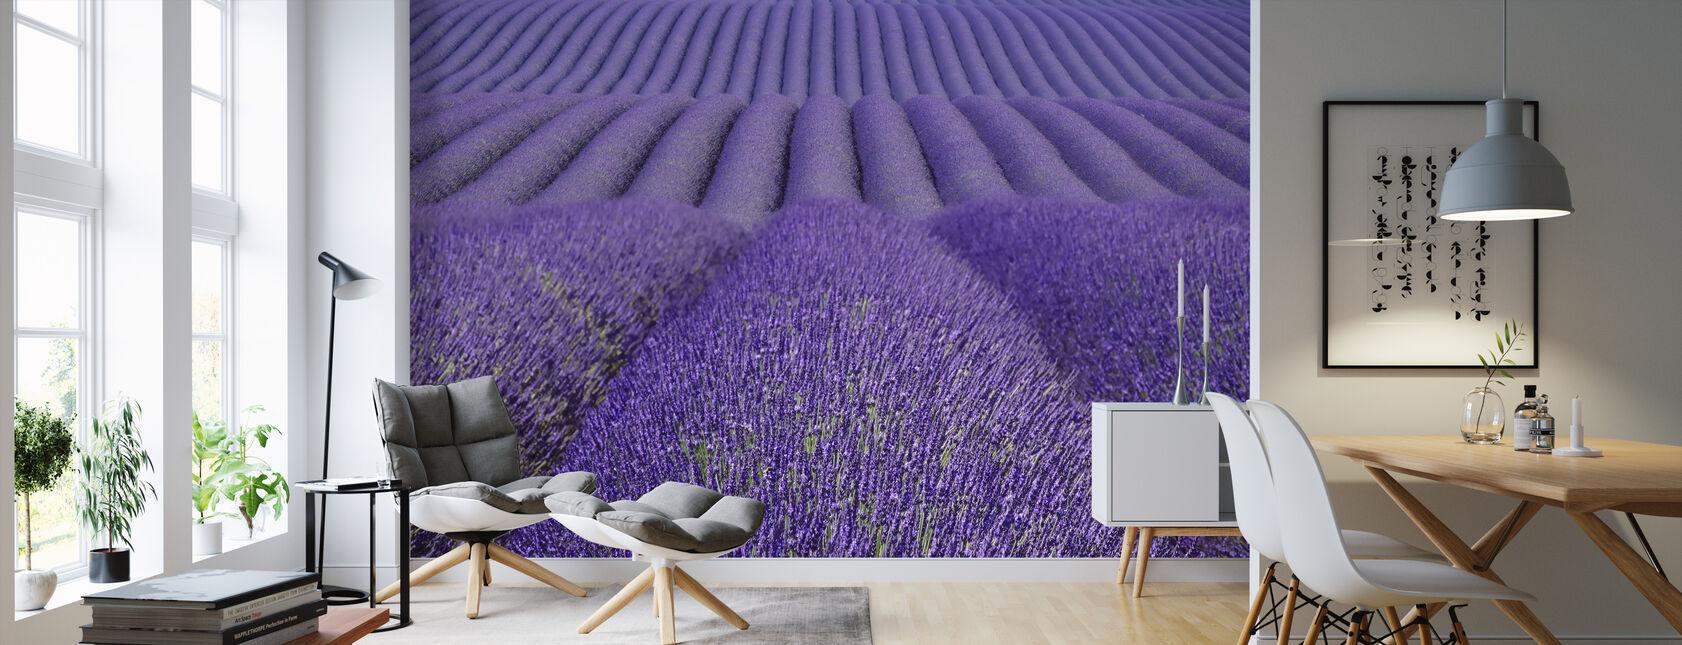 Purple Lavender Field - Wallpaper - Living Room